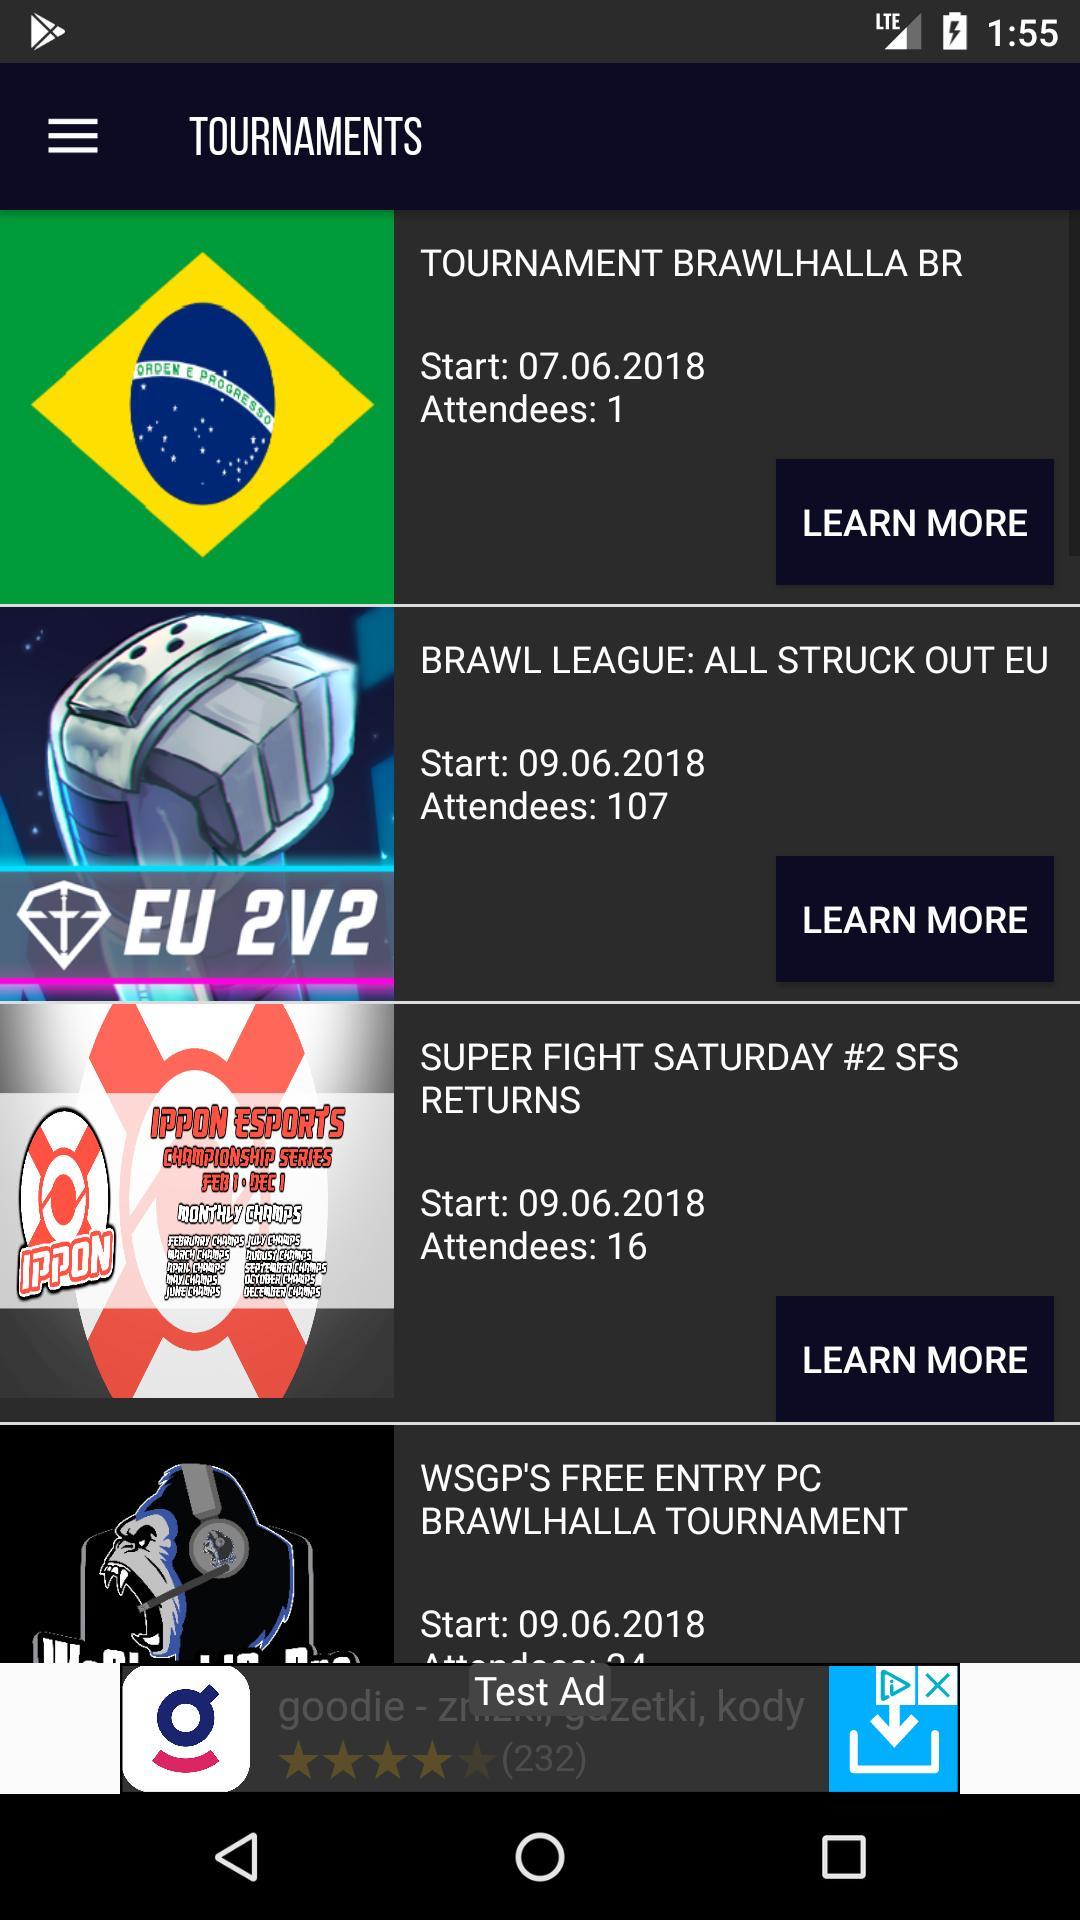 Brawlhalla Lore para Android - APK Baixar